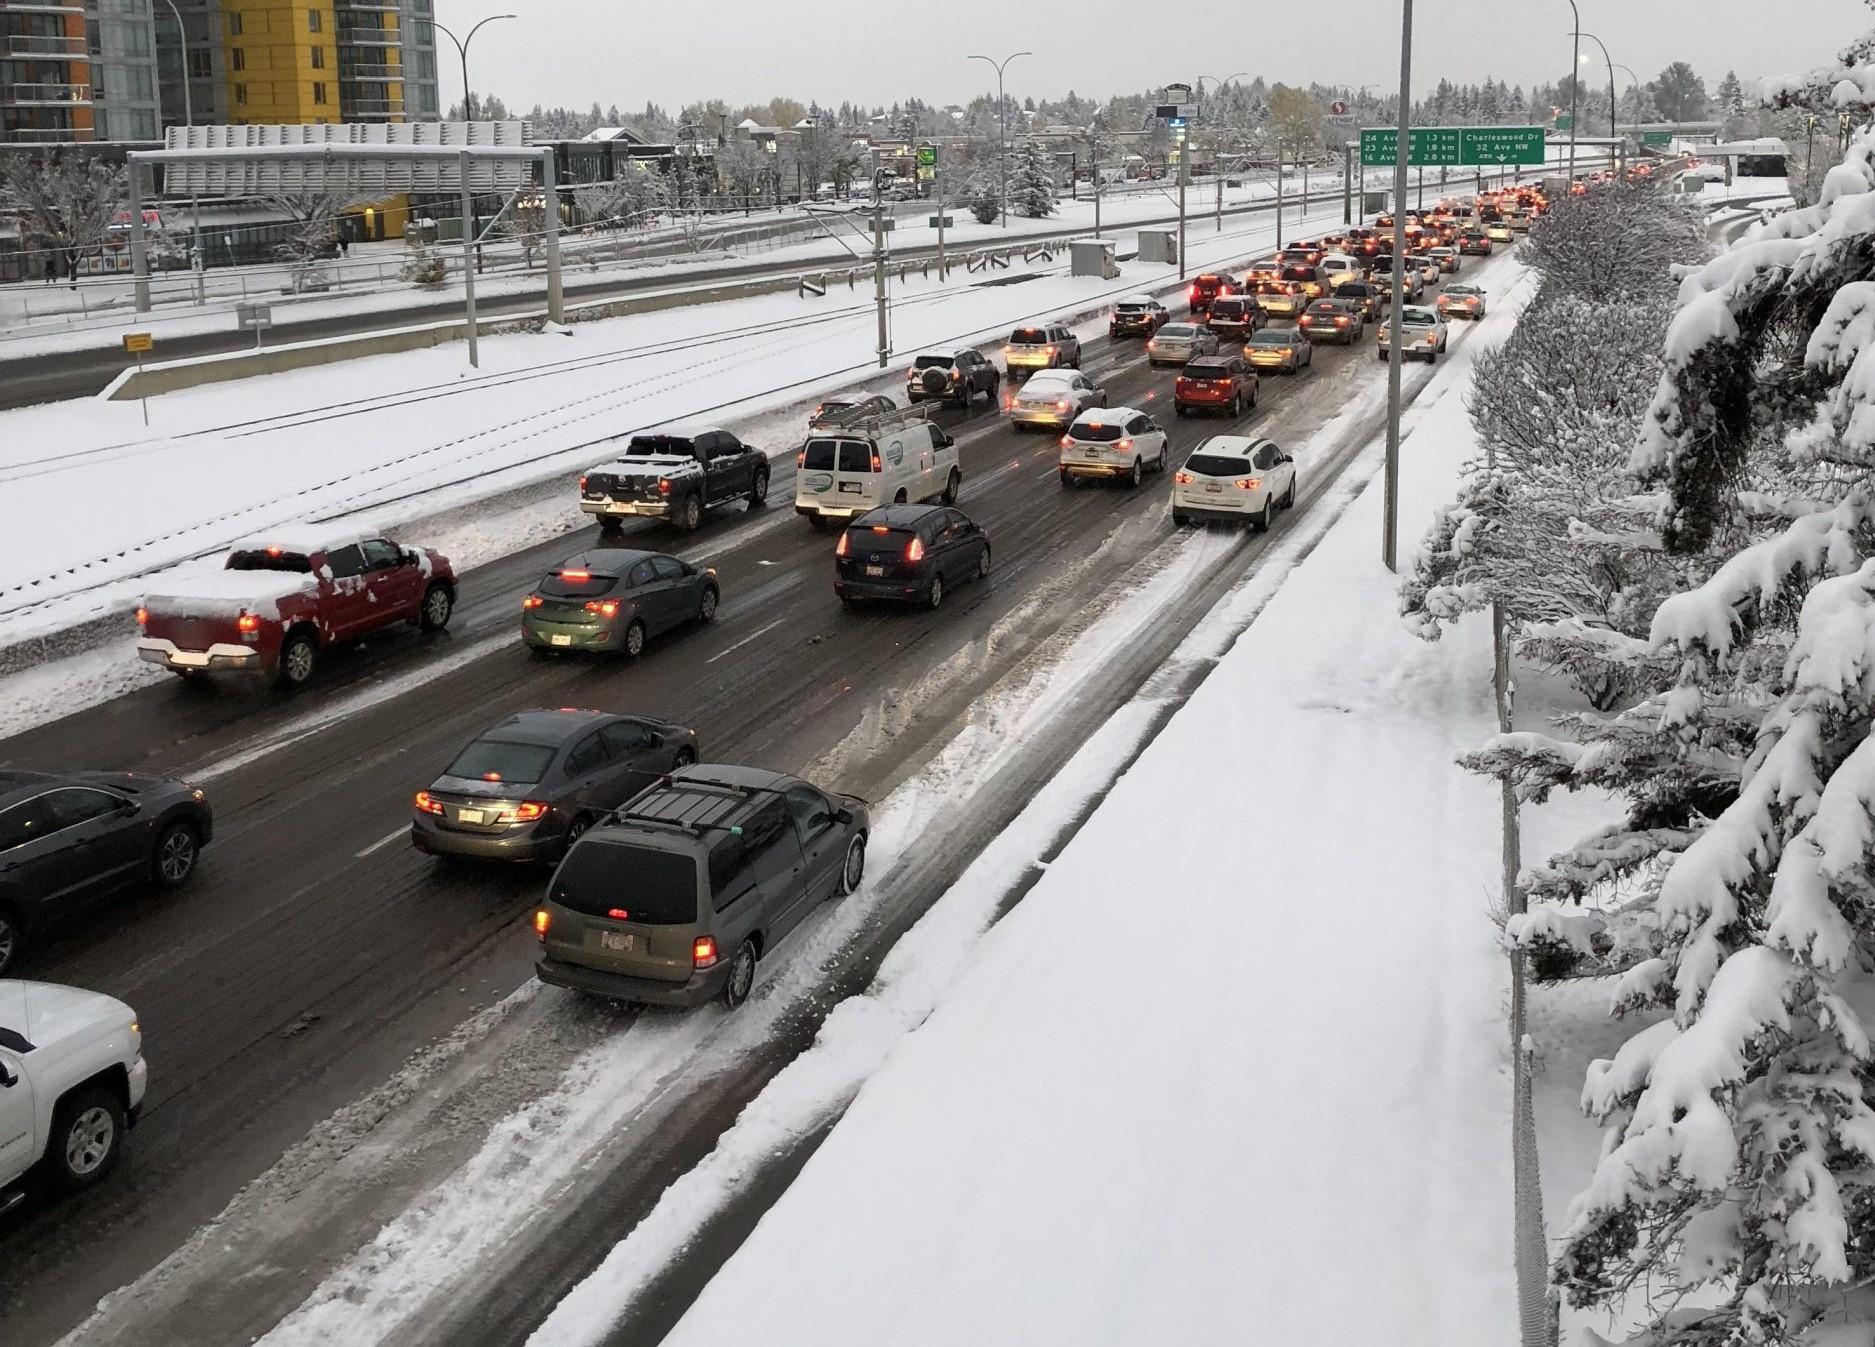 Alberta highways face closures after massive snowfall